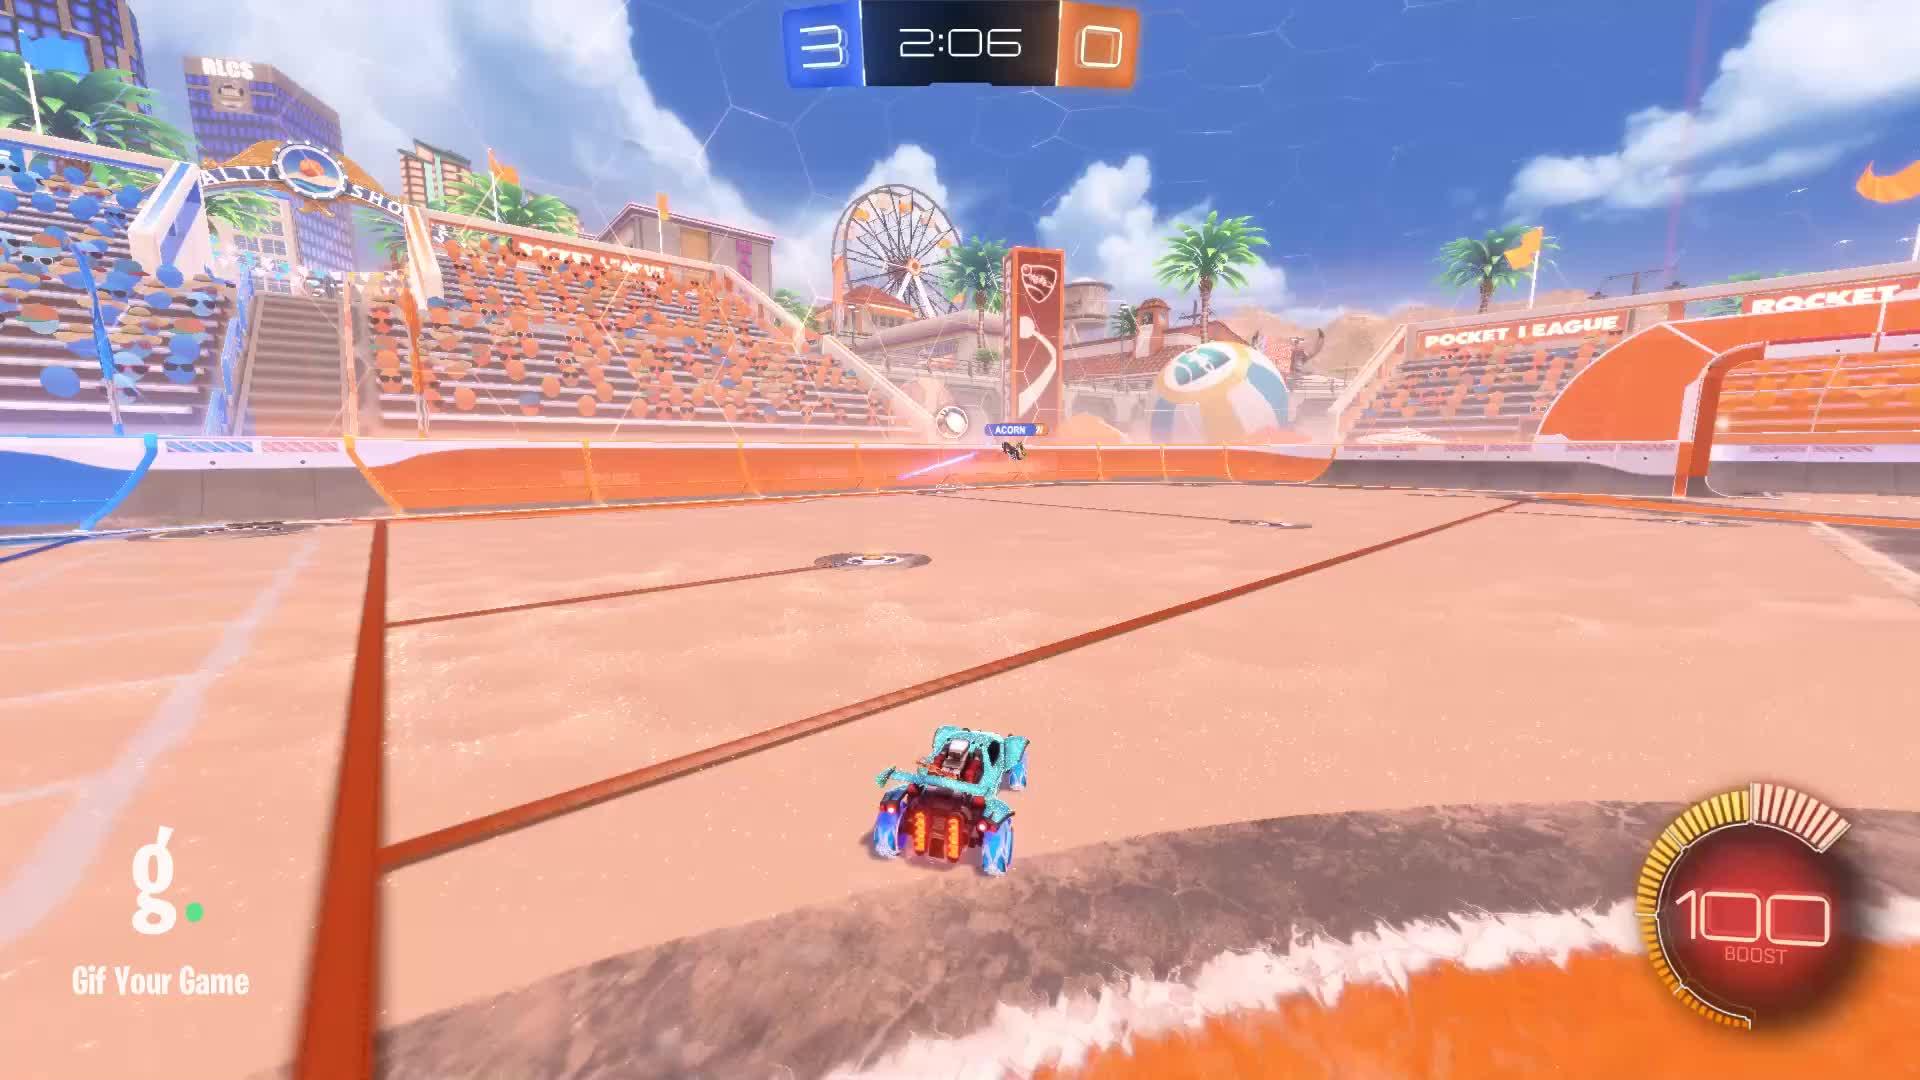 Ace, Gif Your Game, GifYourGame, Goal, Rocket League, RocketLeague, Goal 4: Ace GIFs